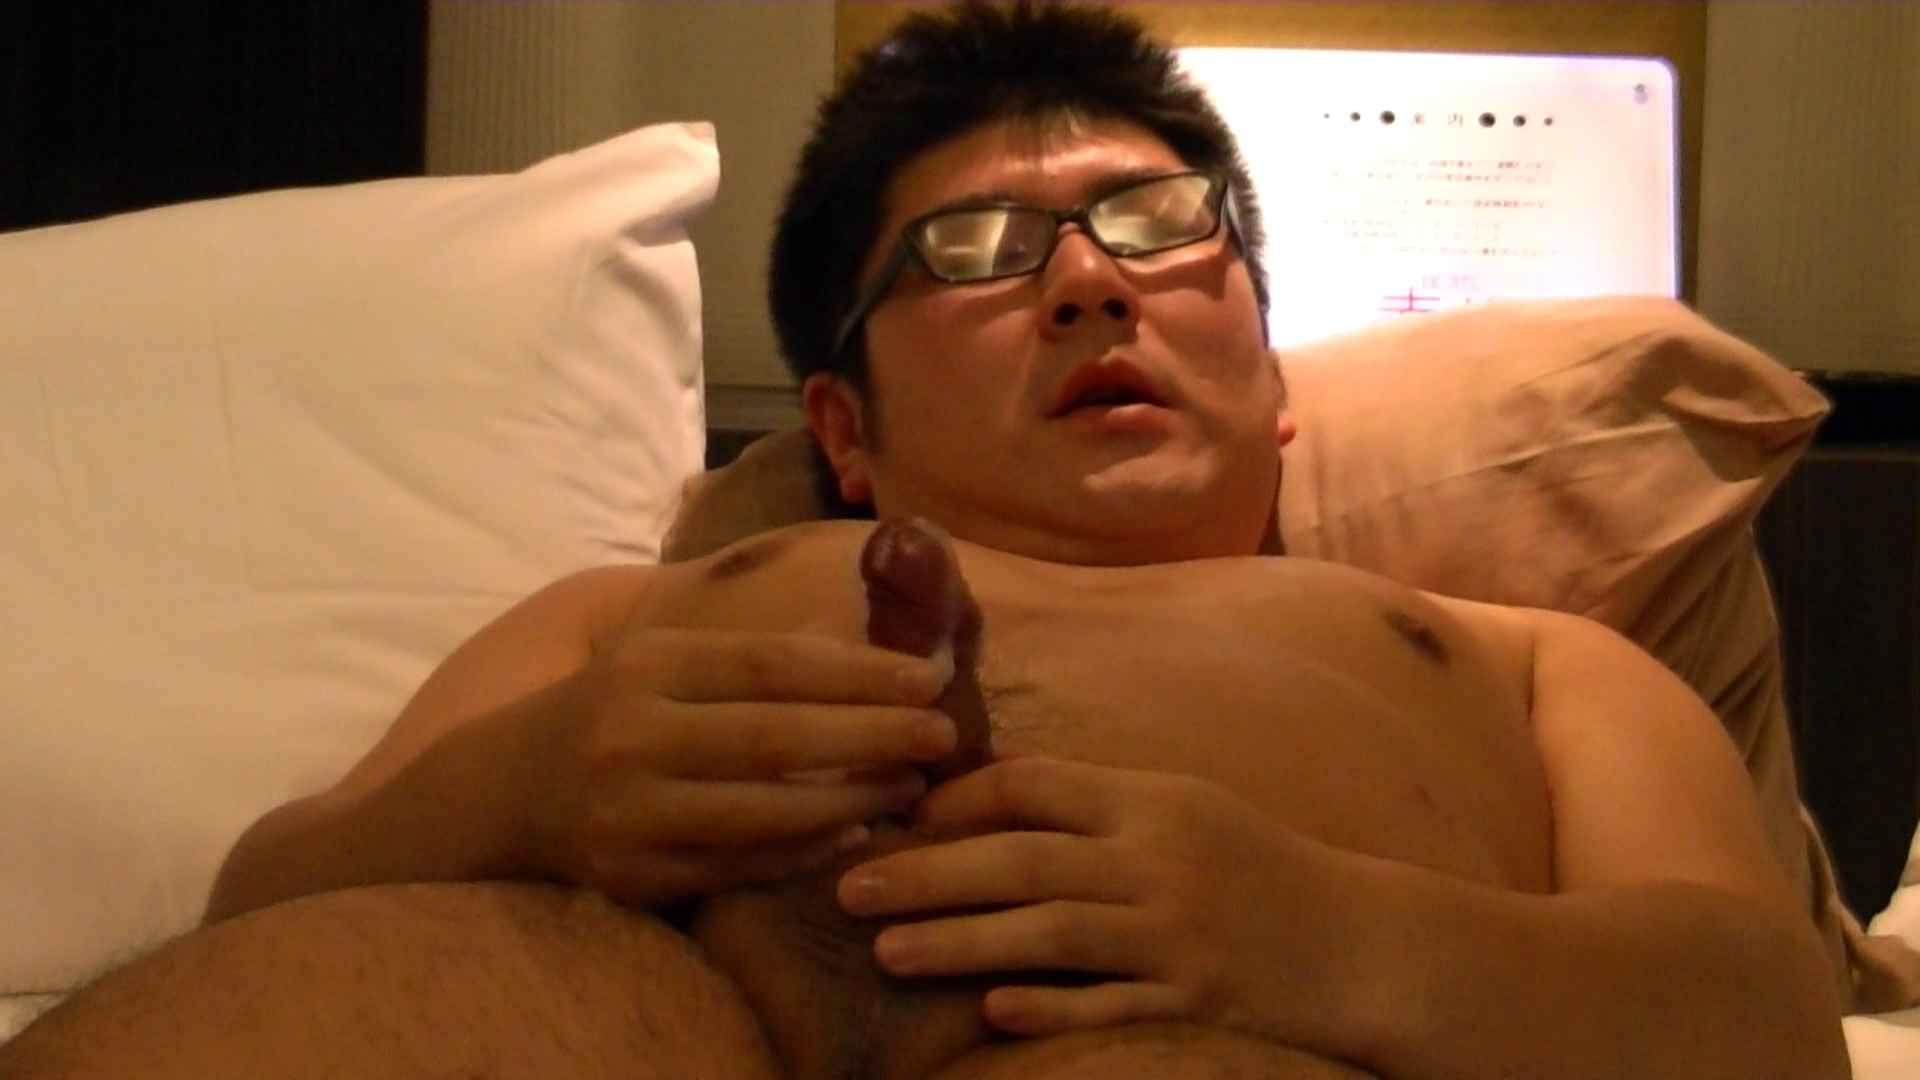 Mr.オナックスさん投稿!HD 貴方のオナニー三万円で撮影させてください。VOL.03 後編 完全無修正版  106枚 18